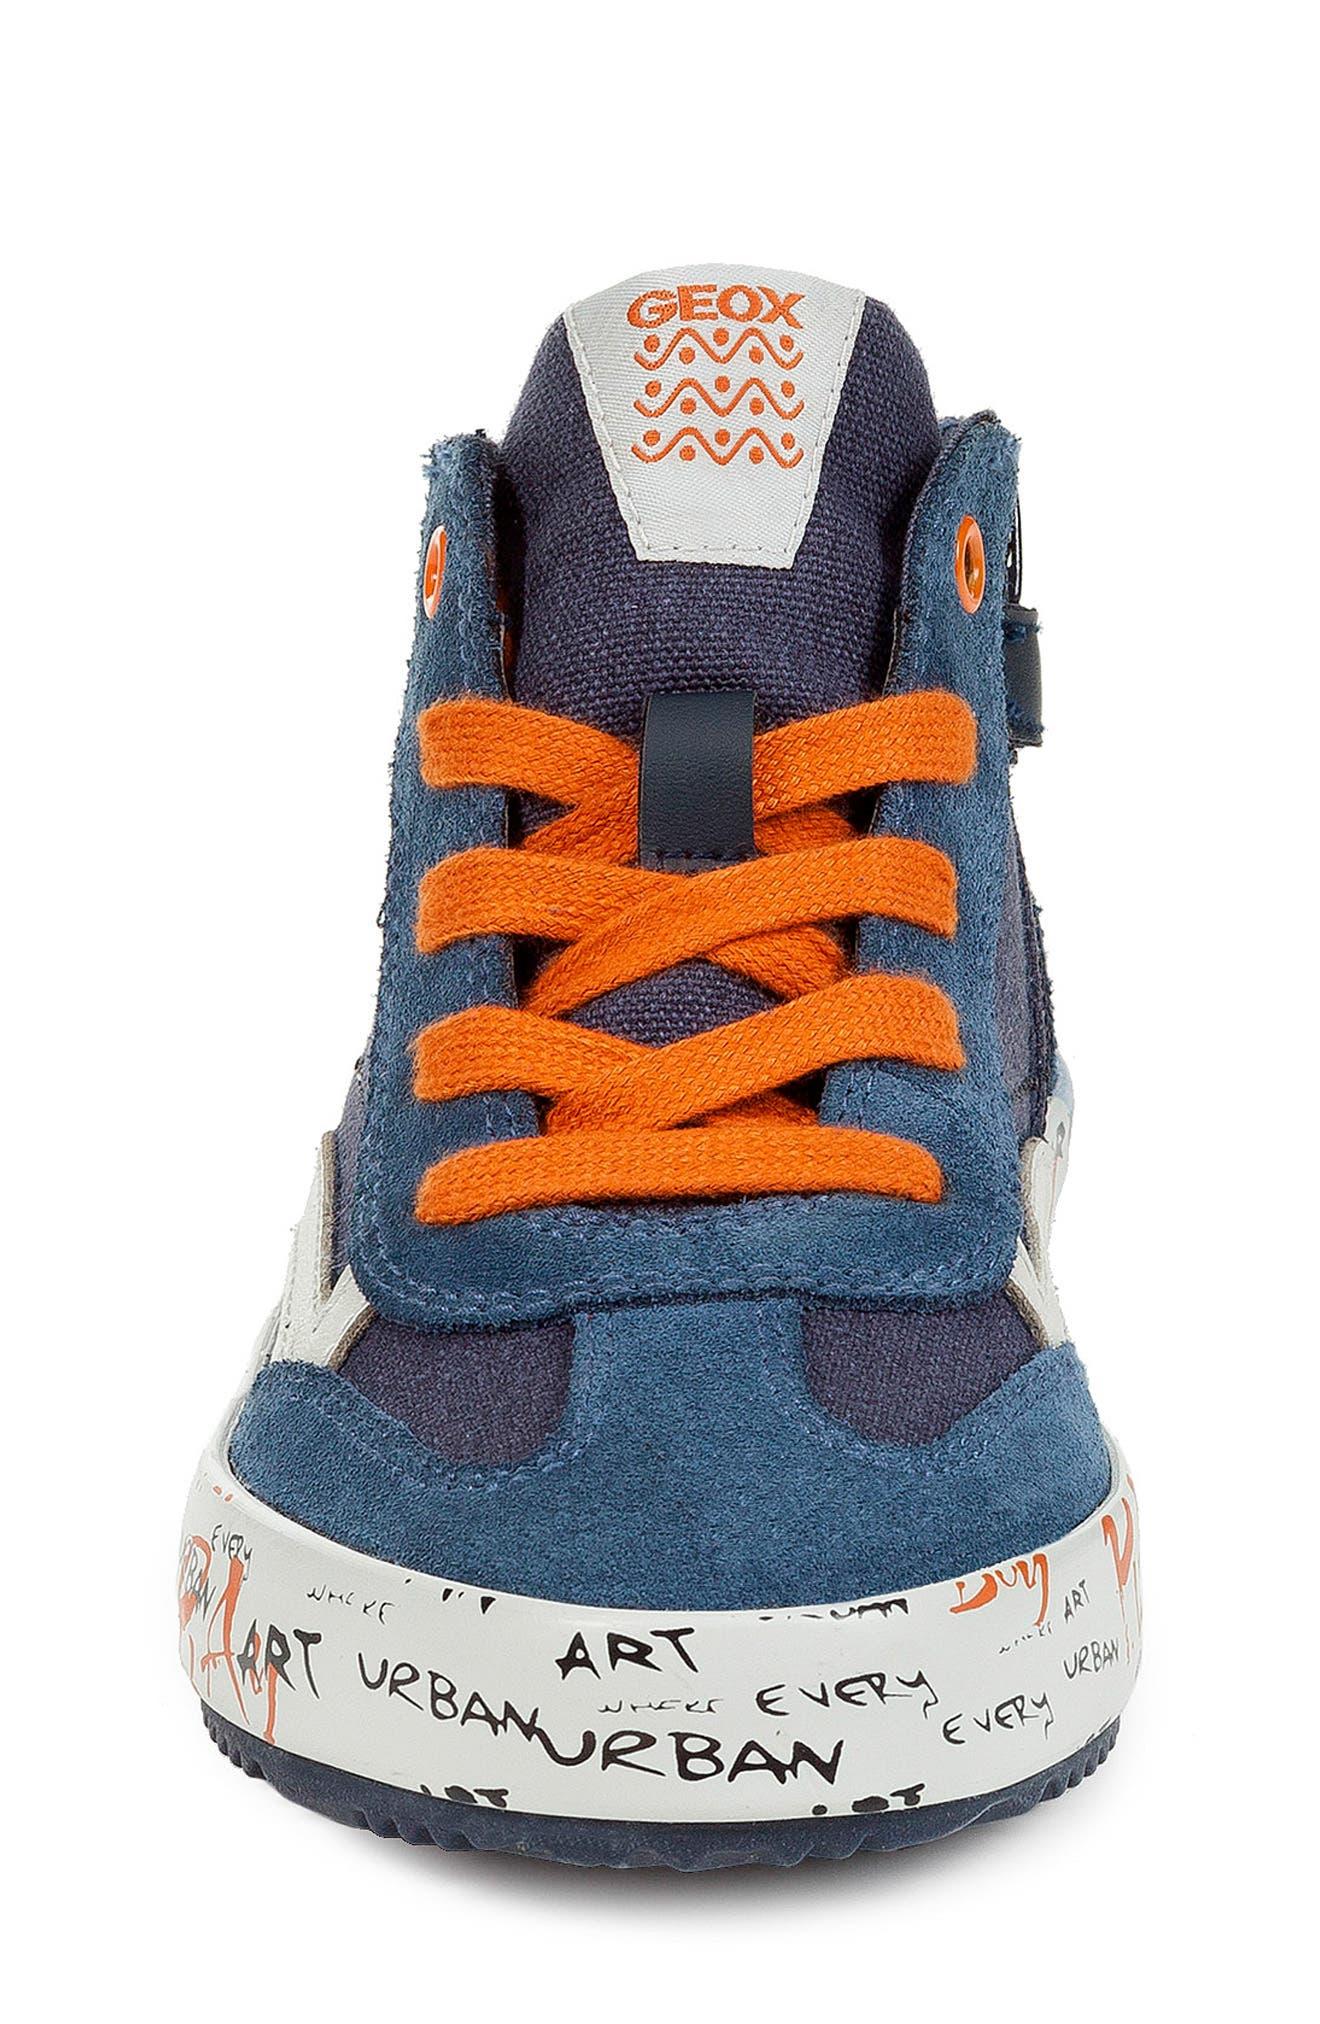 Alonisso 34 High Top Sneaker,                             Alternate thumbnail 4, color,                             NAVY/ DARK ORANGE